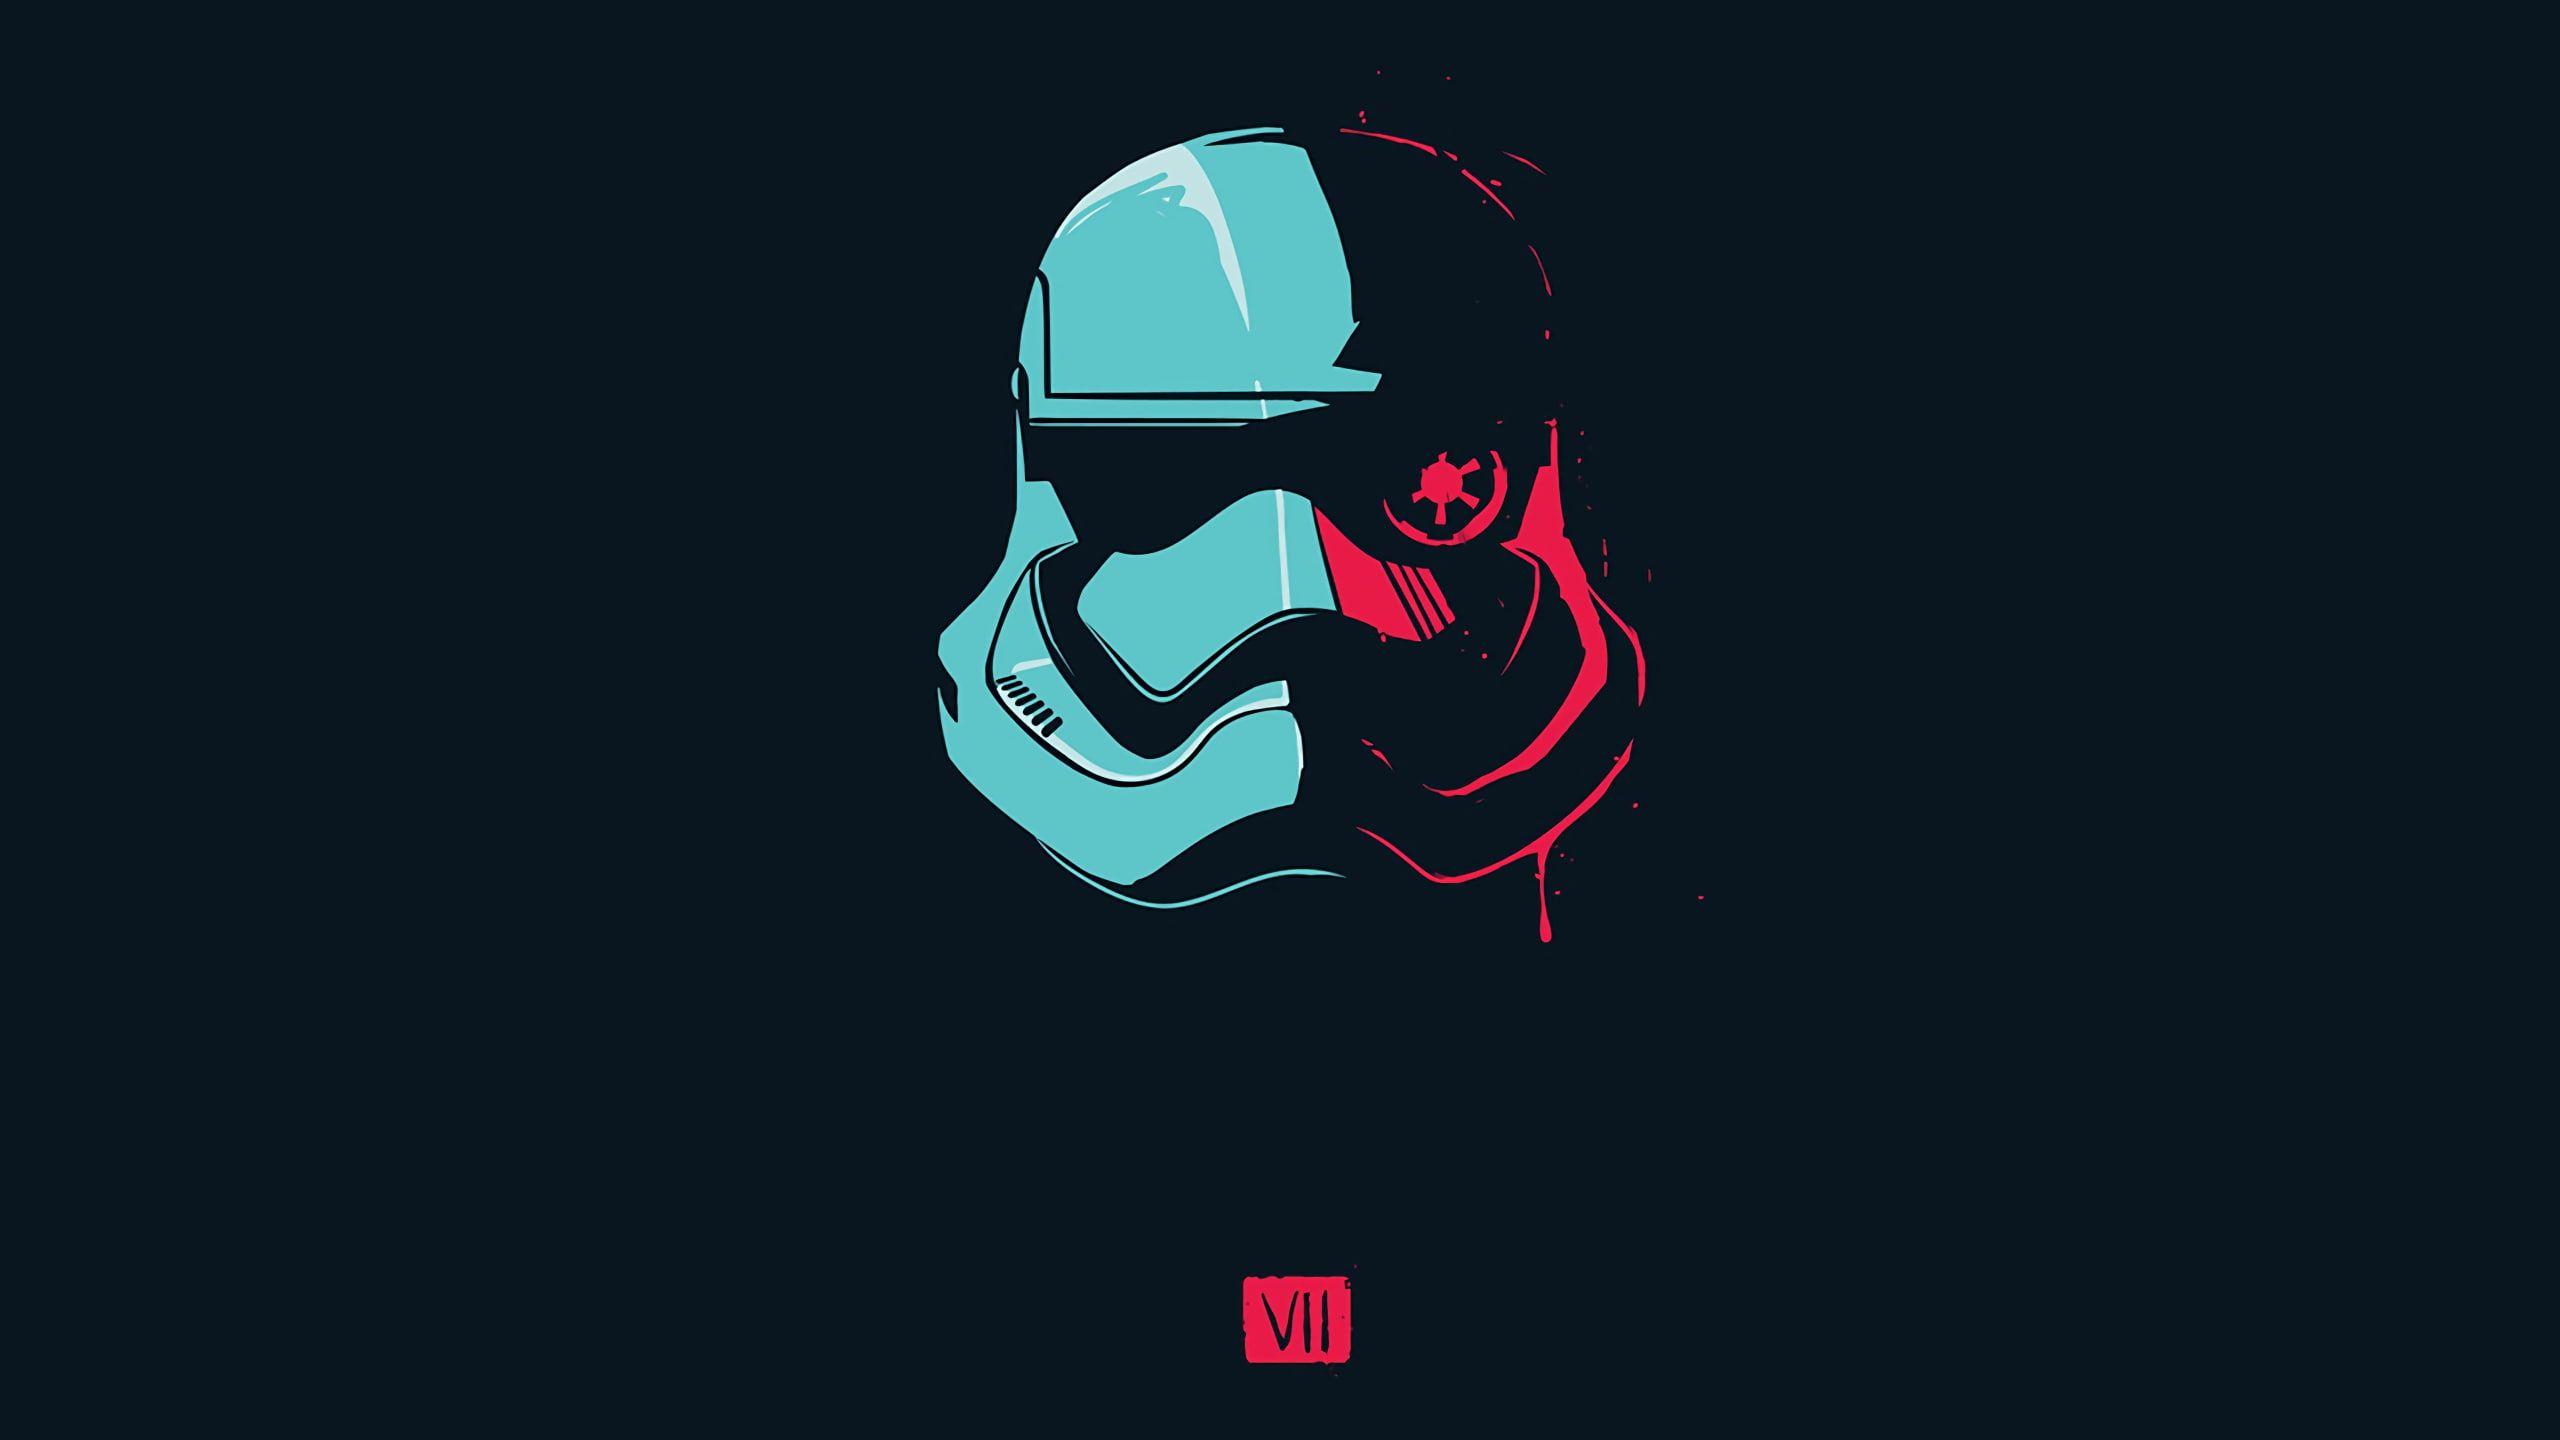 Darth Vader Wallpaper Star Wars Star Wars The Force Awakens Stormtrooper 2k Wallpaper Hdwallpape Darth Vader Wallpaper Star Wars Background Star Wars Logo